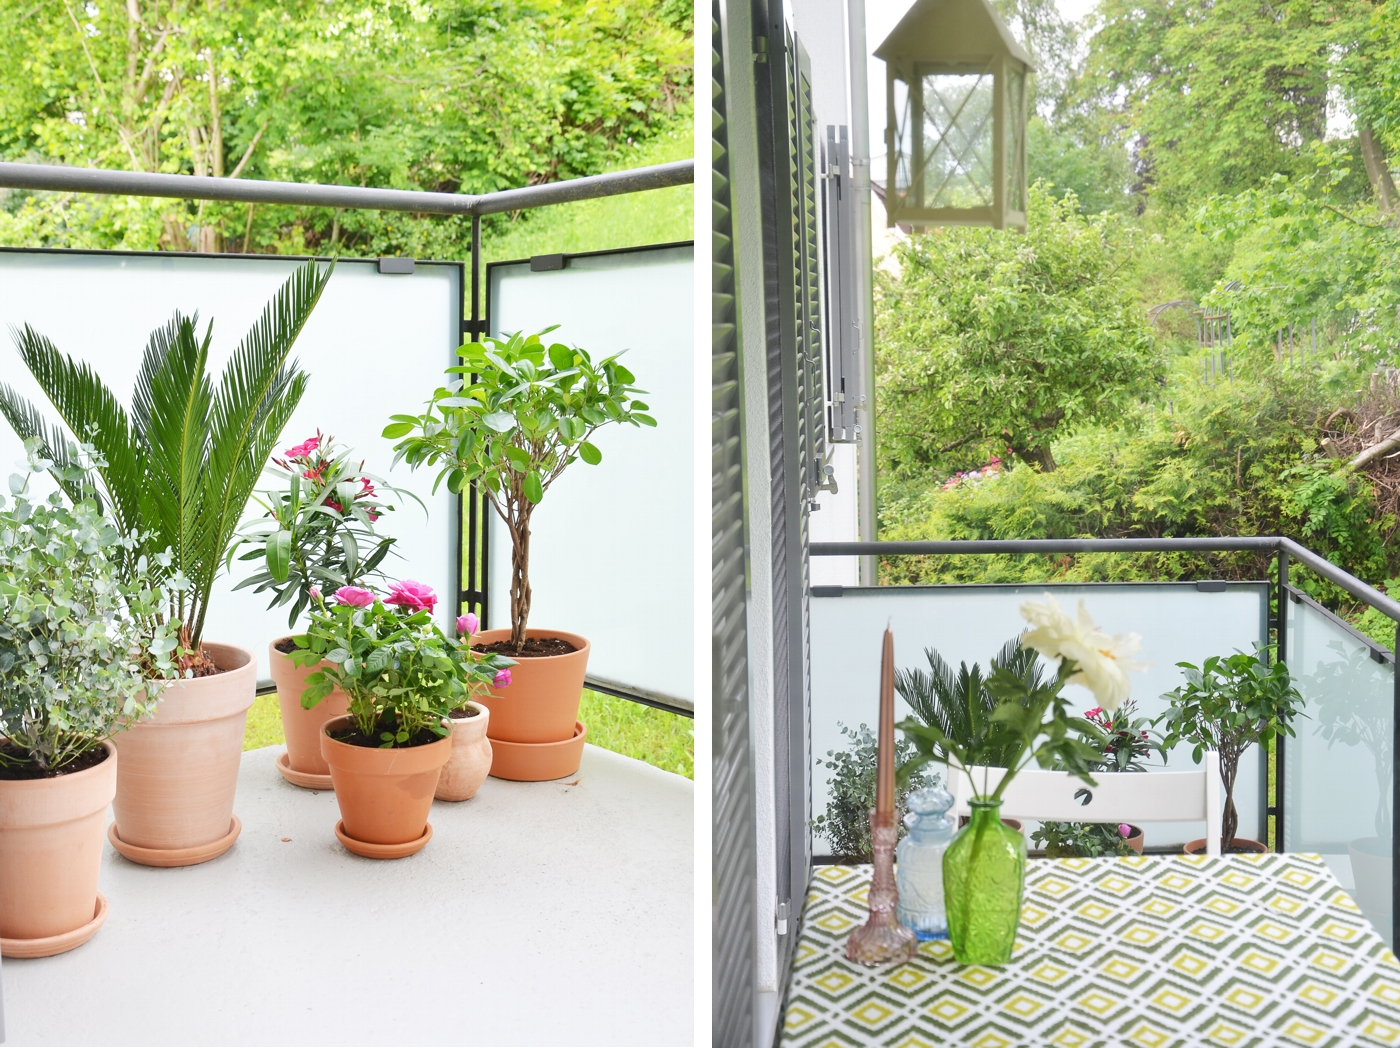 Szybka metamorfoza balkonu